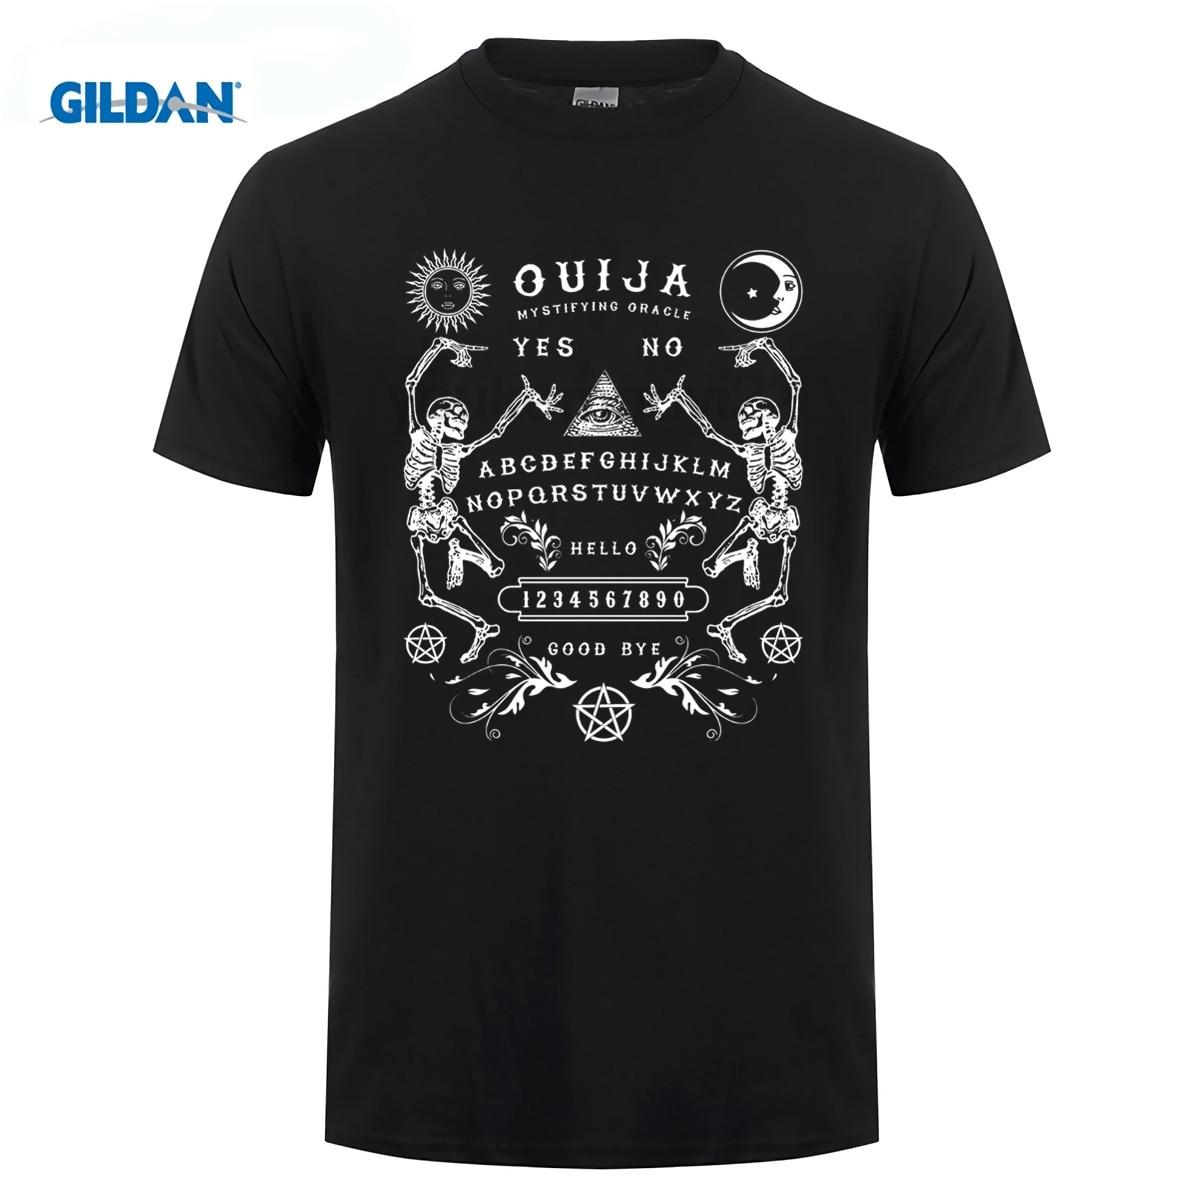 GILDAN New Arrival Men Cotton Men Tee Shirt High Quality Ouija Board Skeletons T-Shirt - Direct From Stockist crossfit T-Shirt